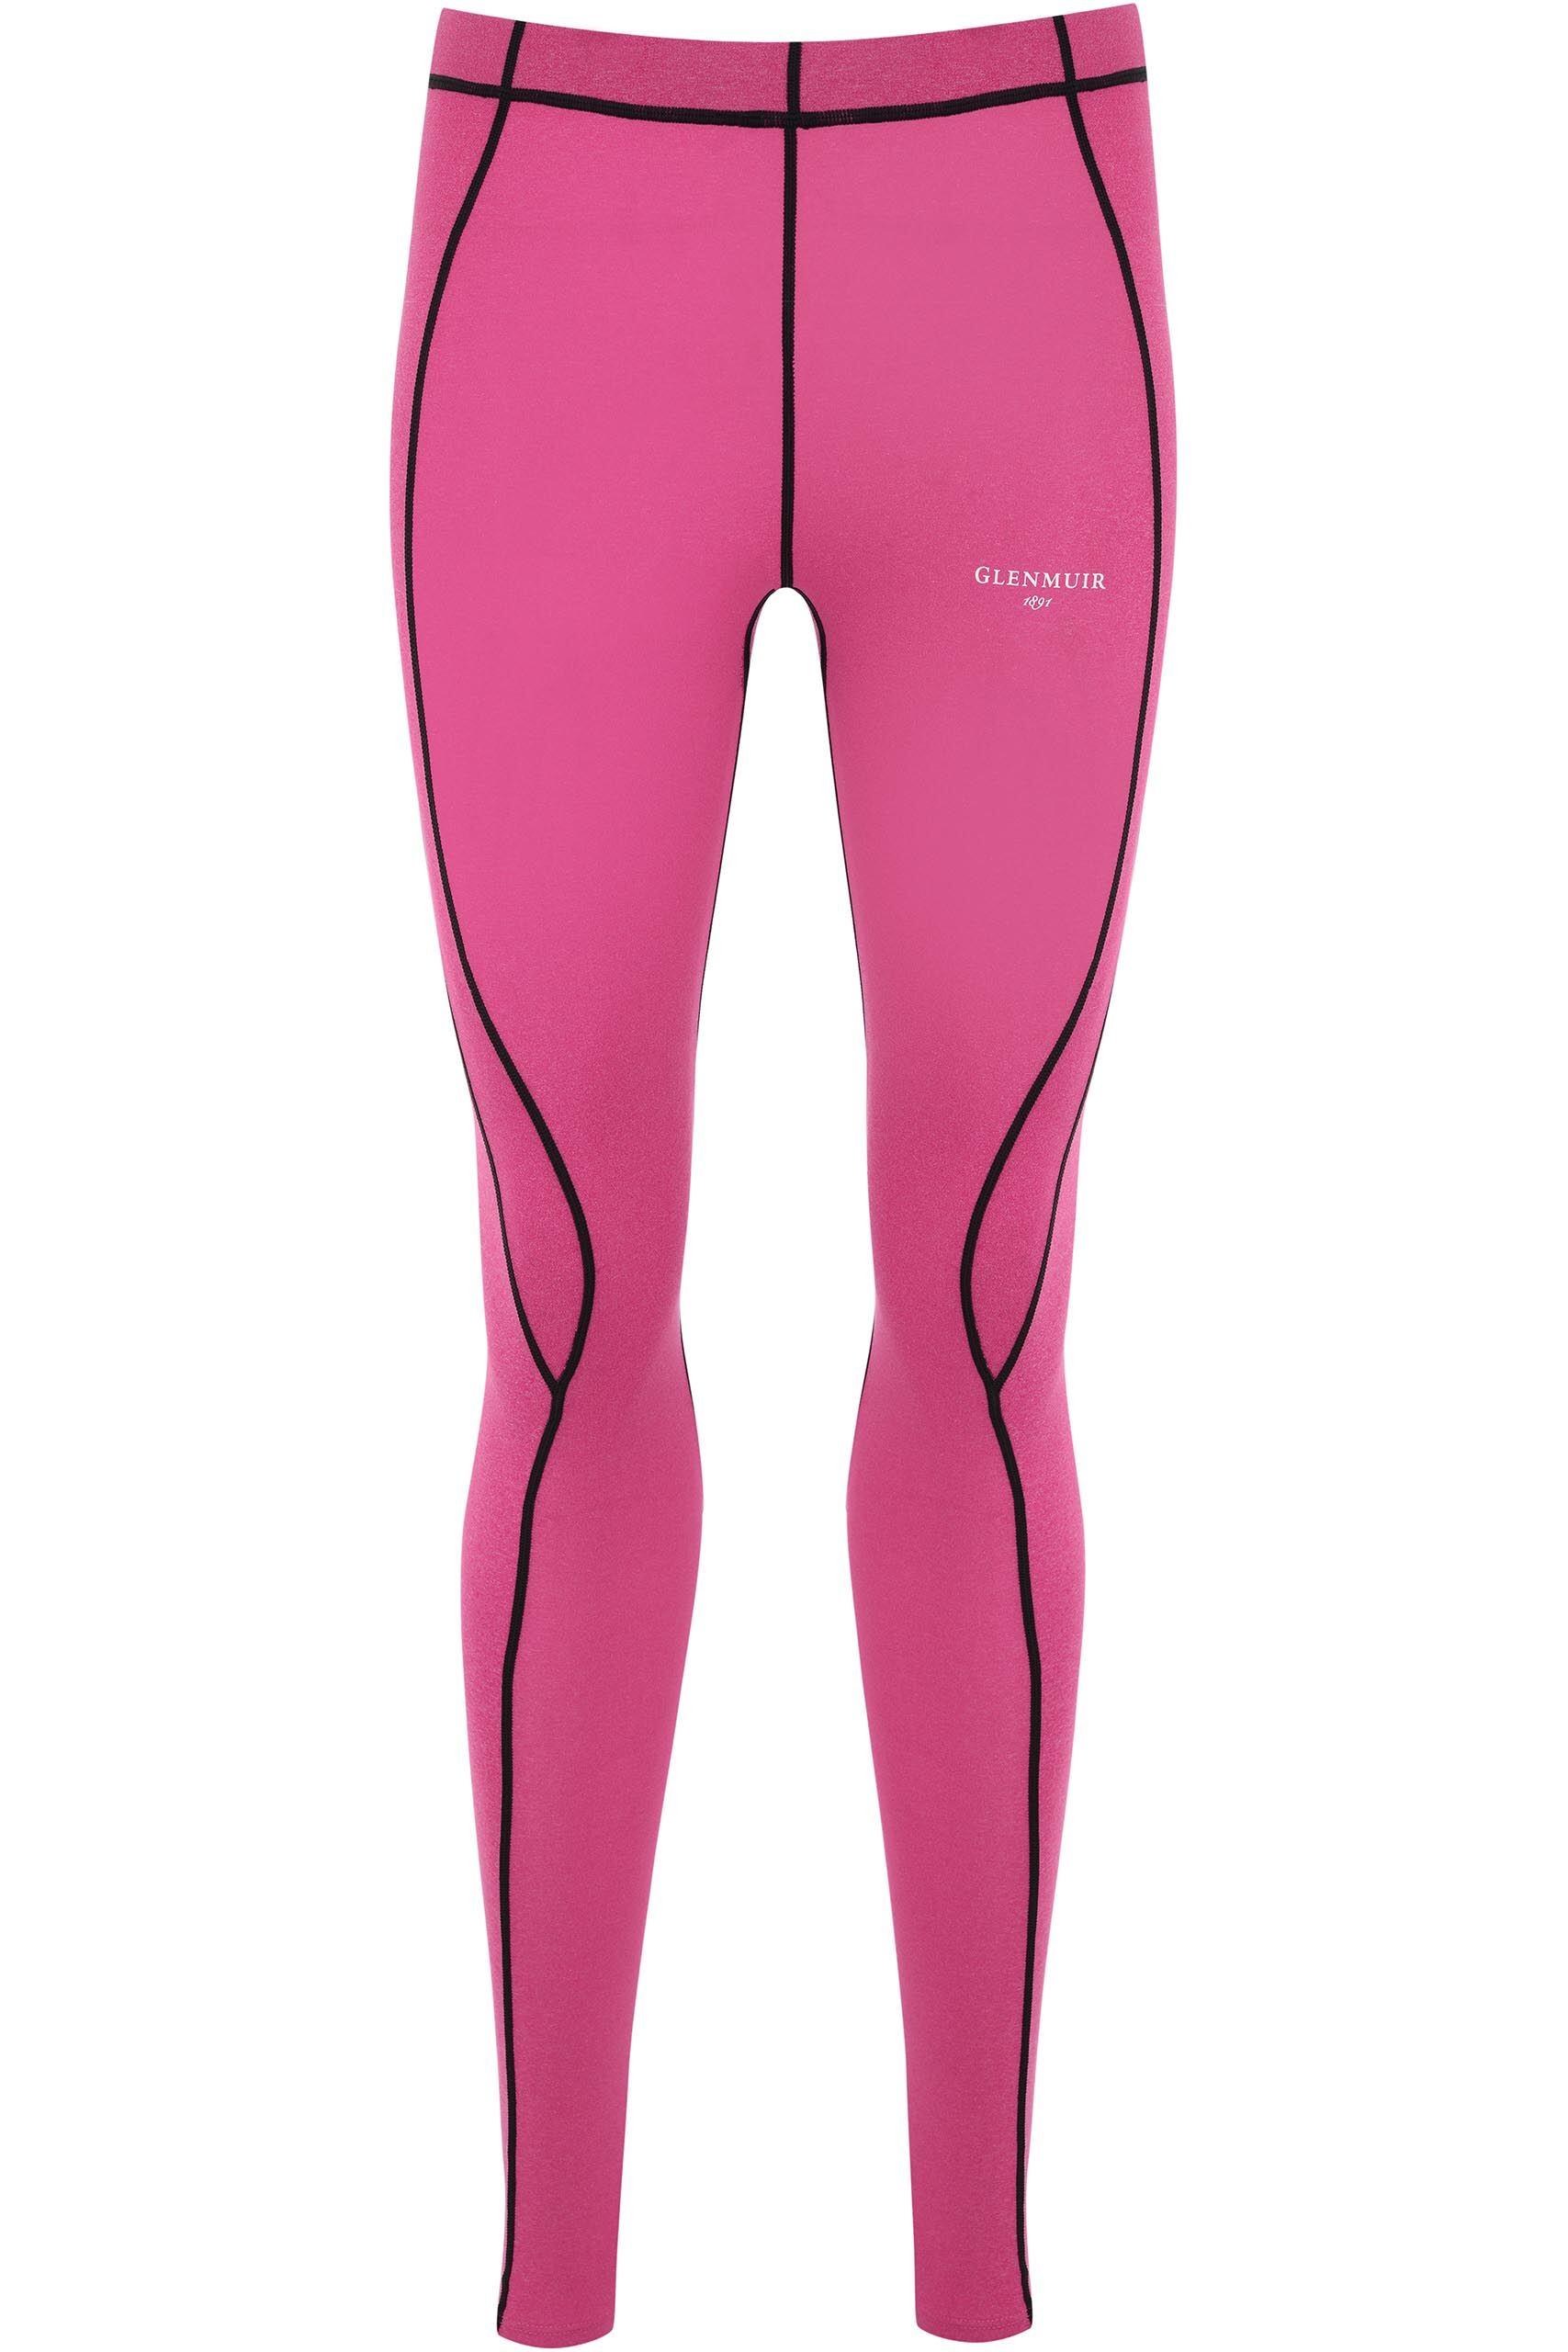 Image of 1 Pack Pink Compression Base Layer Leggings Ladies 12-14 Ladies - Glenmuir